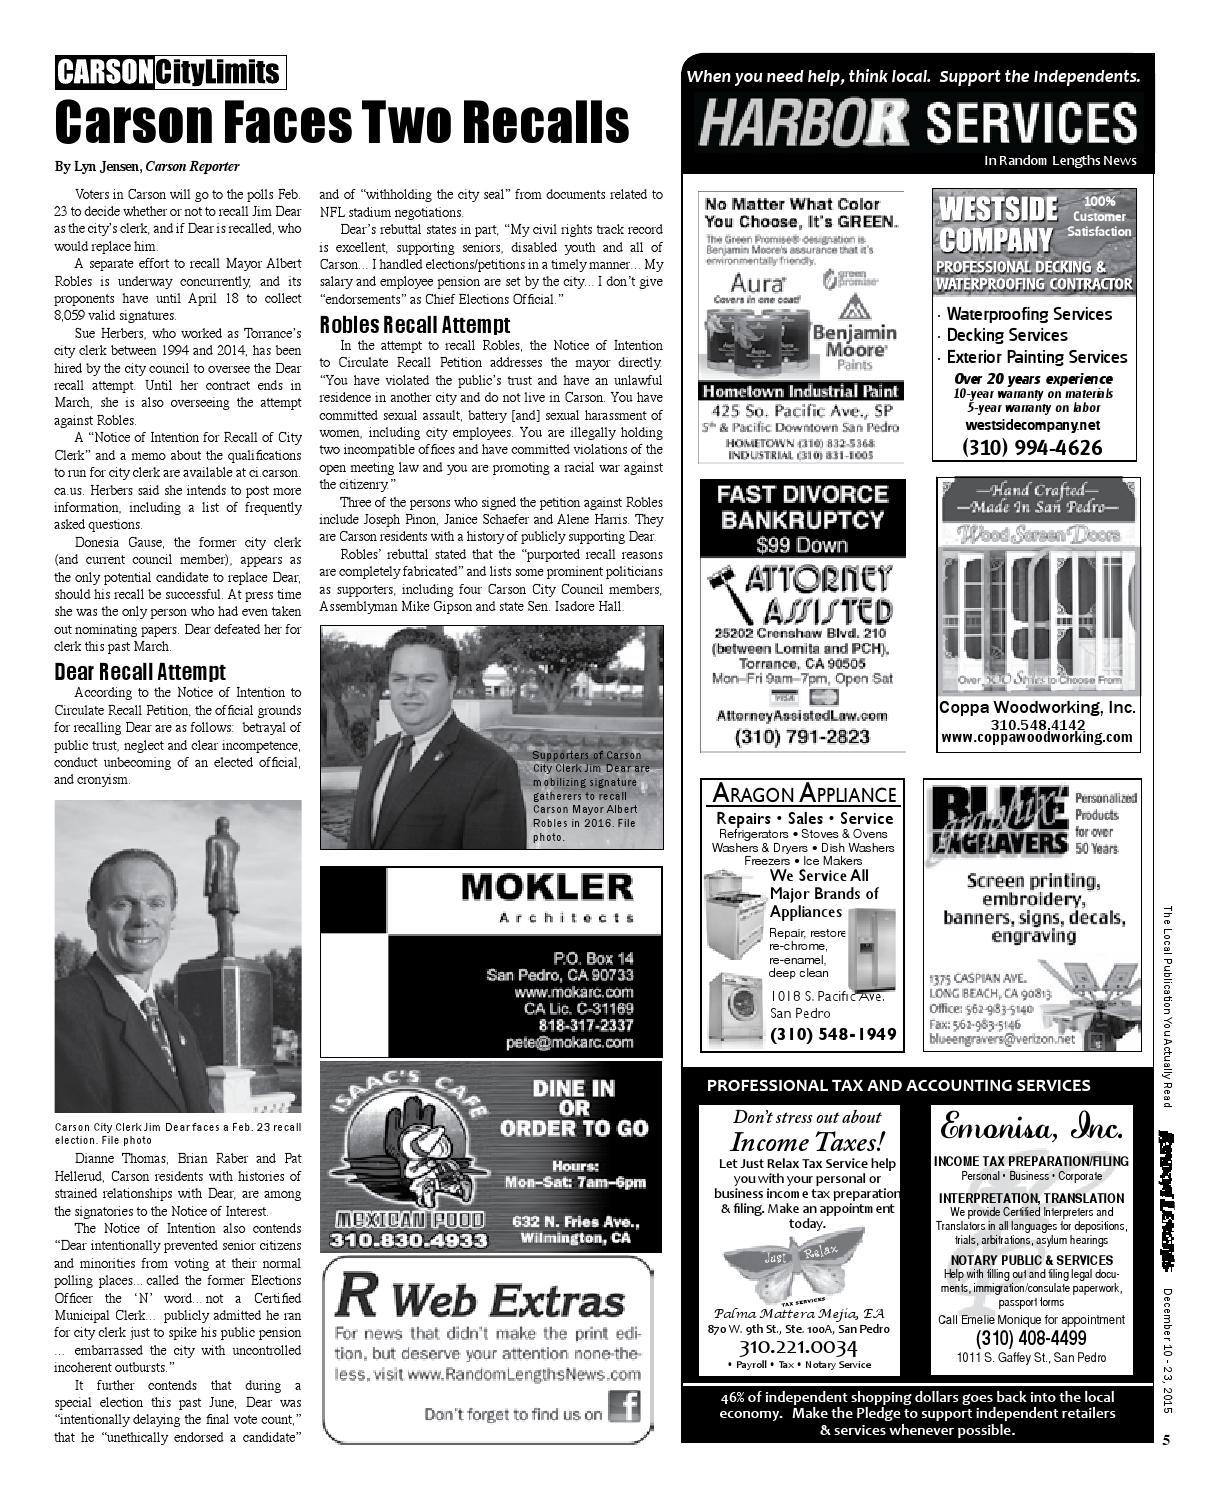 Random Lengths News 12-10-15 Issue by Random Lengths News - issuu